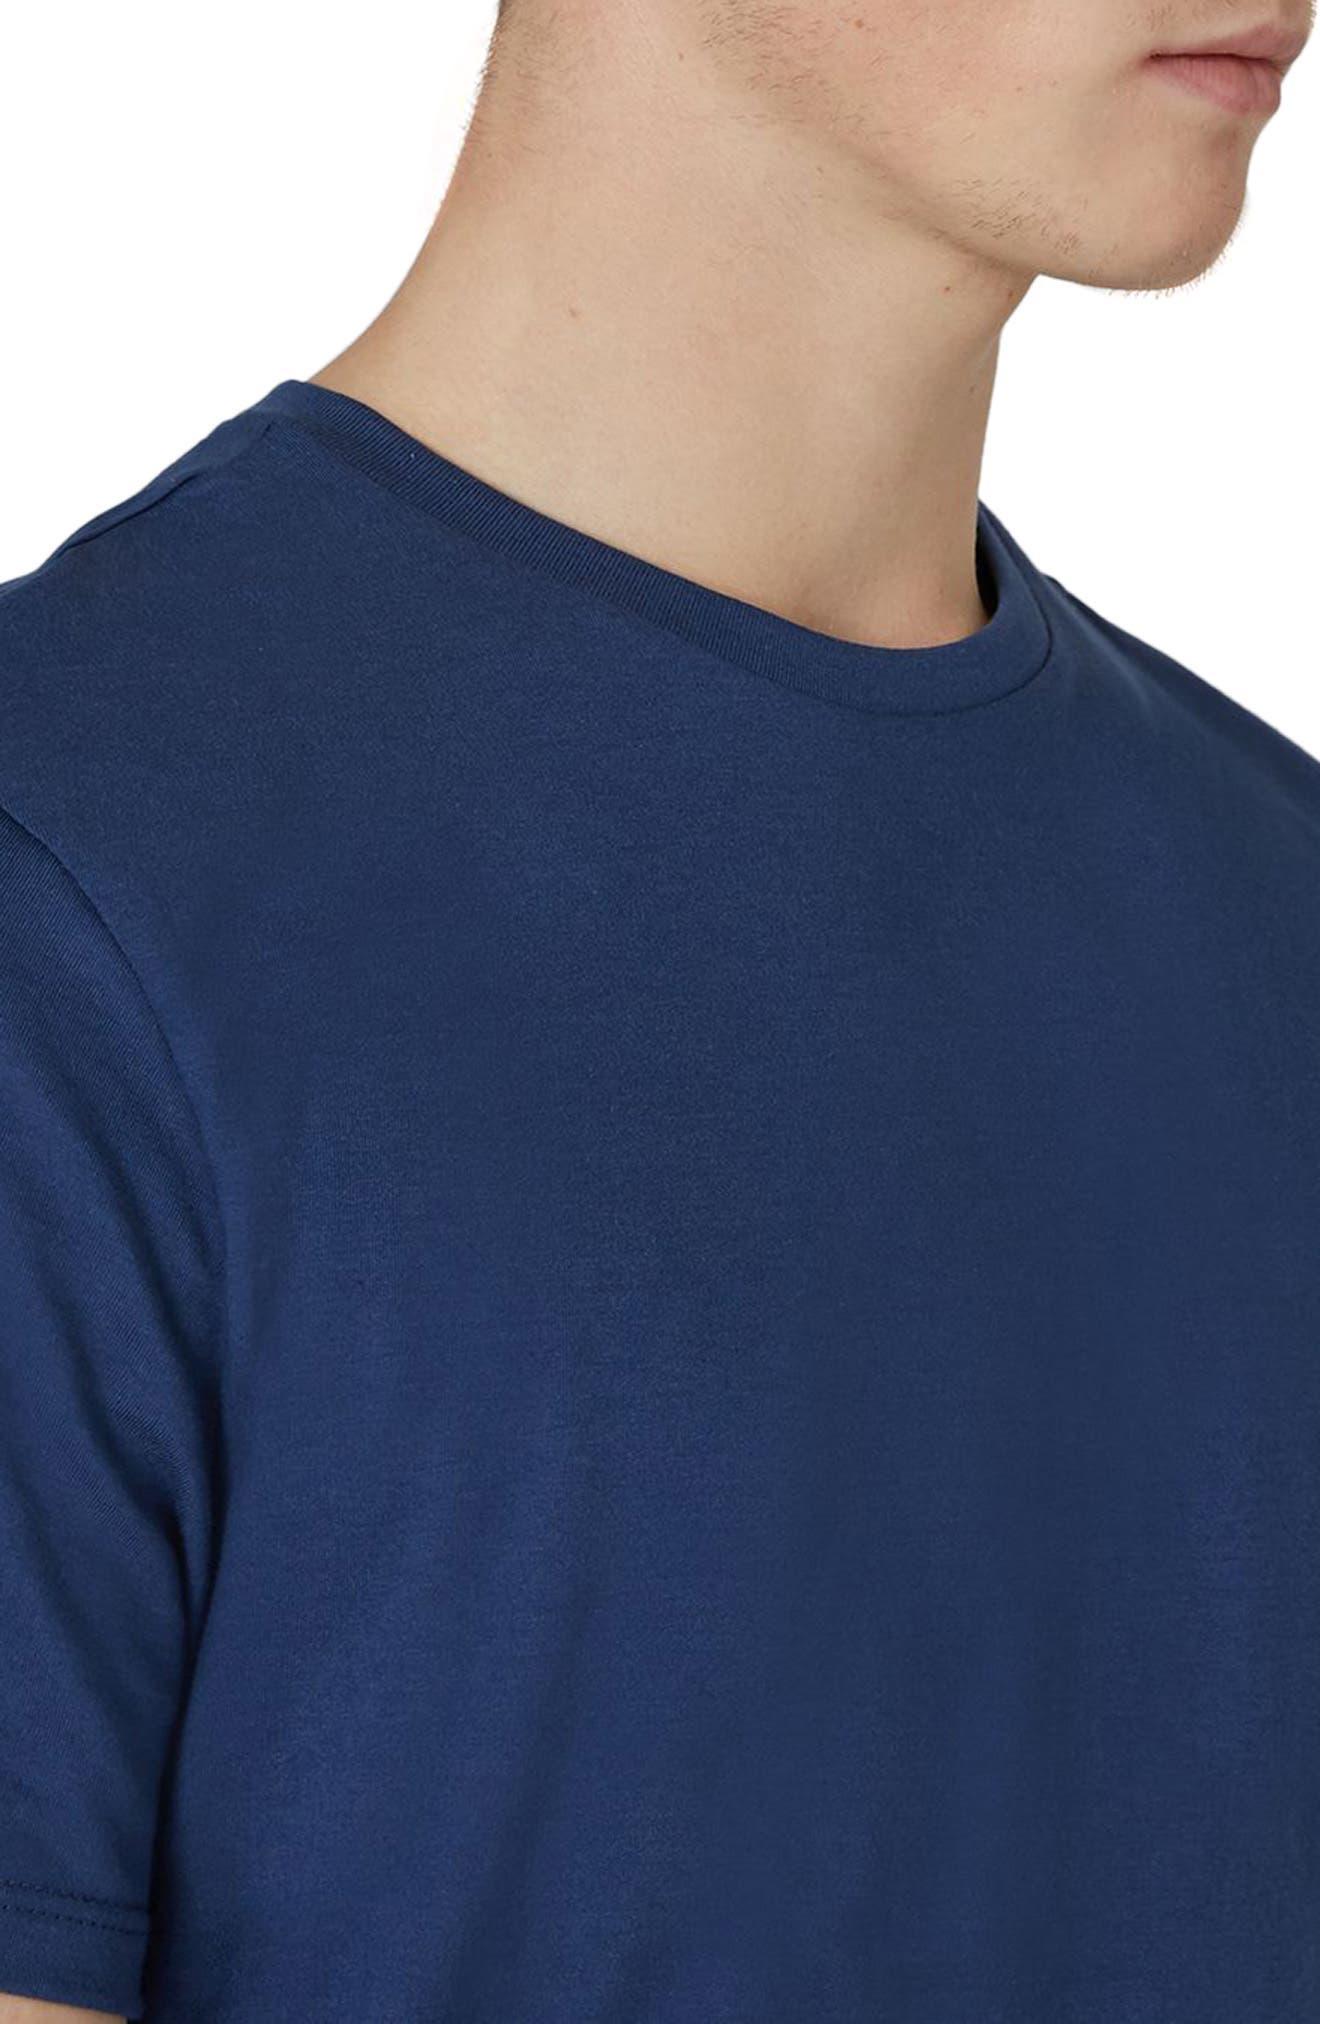 Slim Fit Crewneck T-Shirt,                             Alternate thumbnail 3, color,                             Light Blue